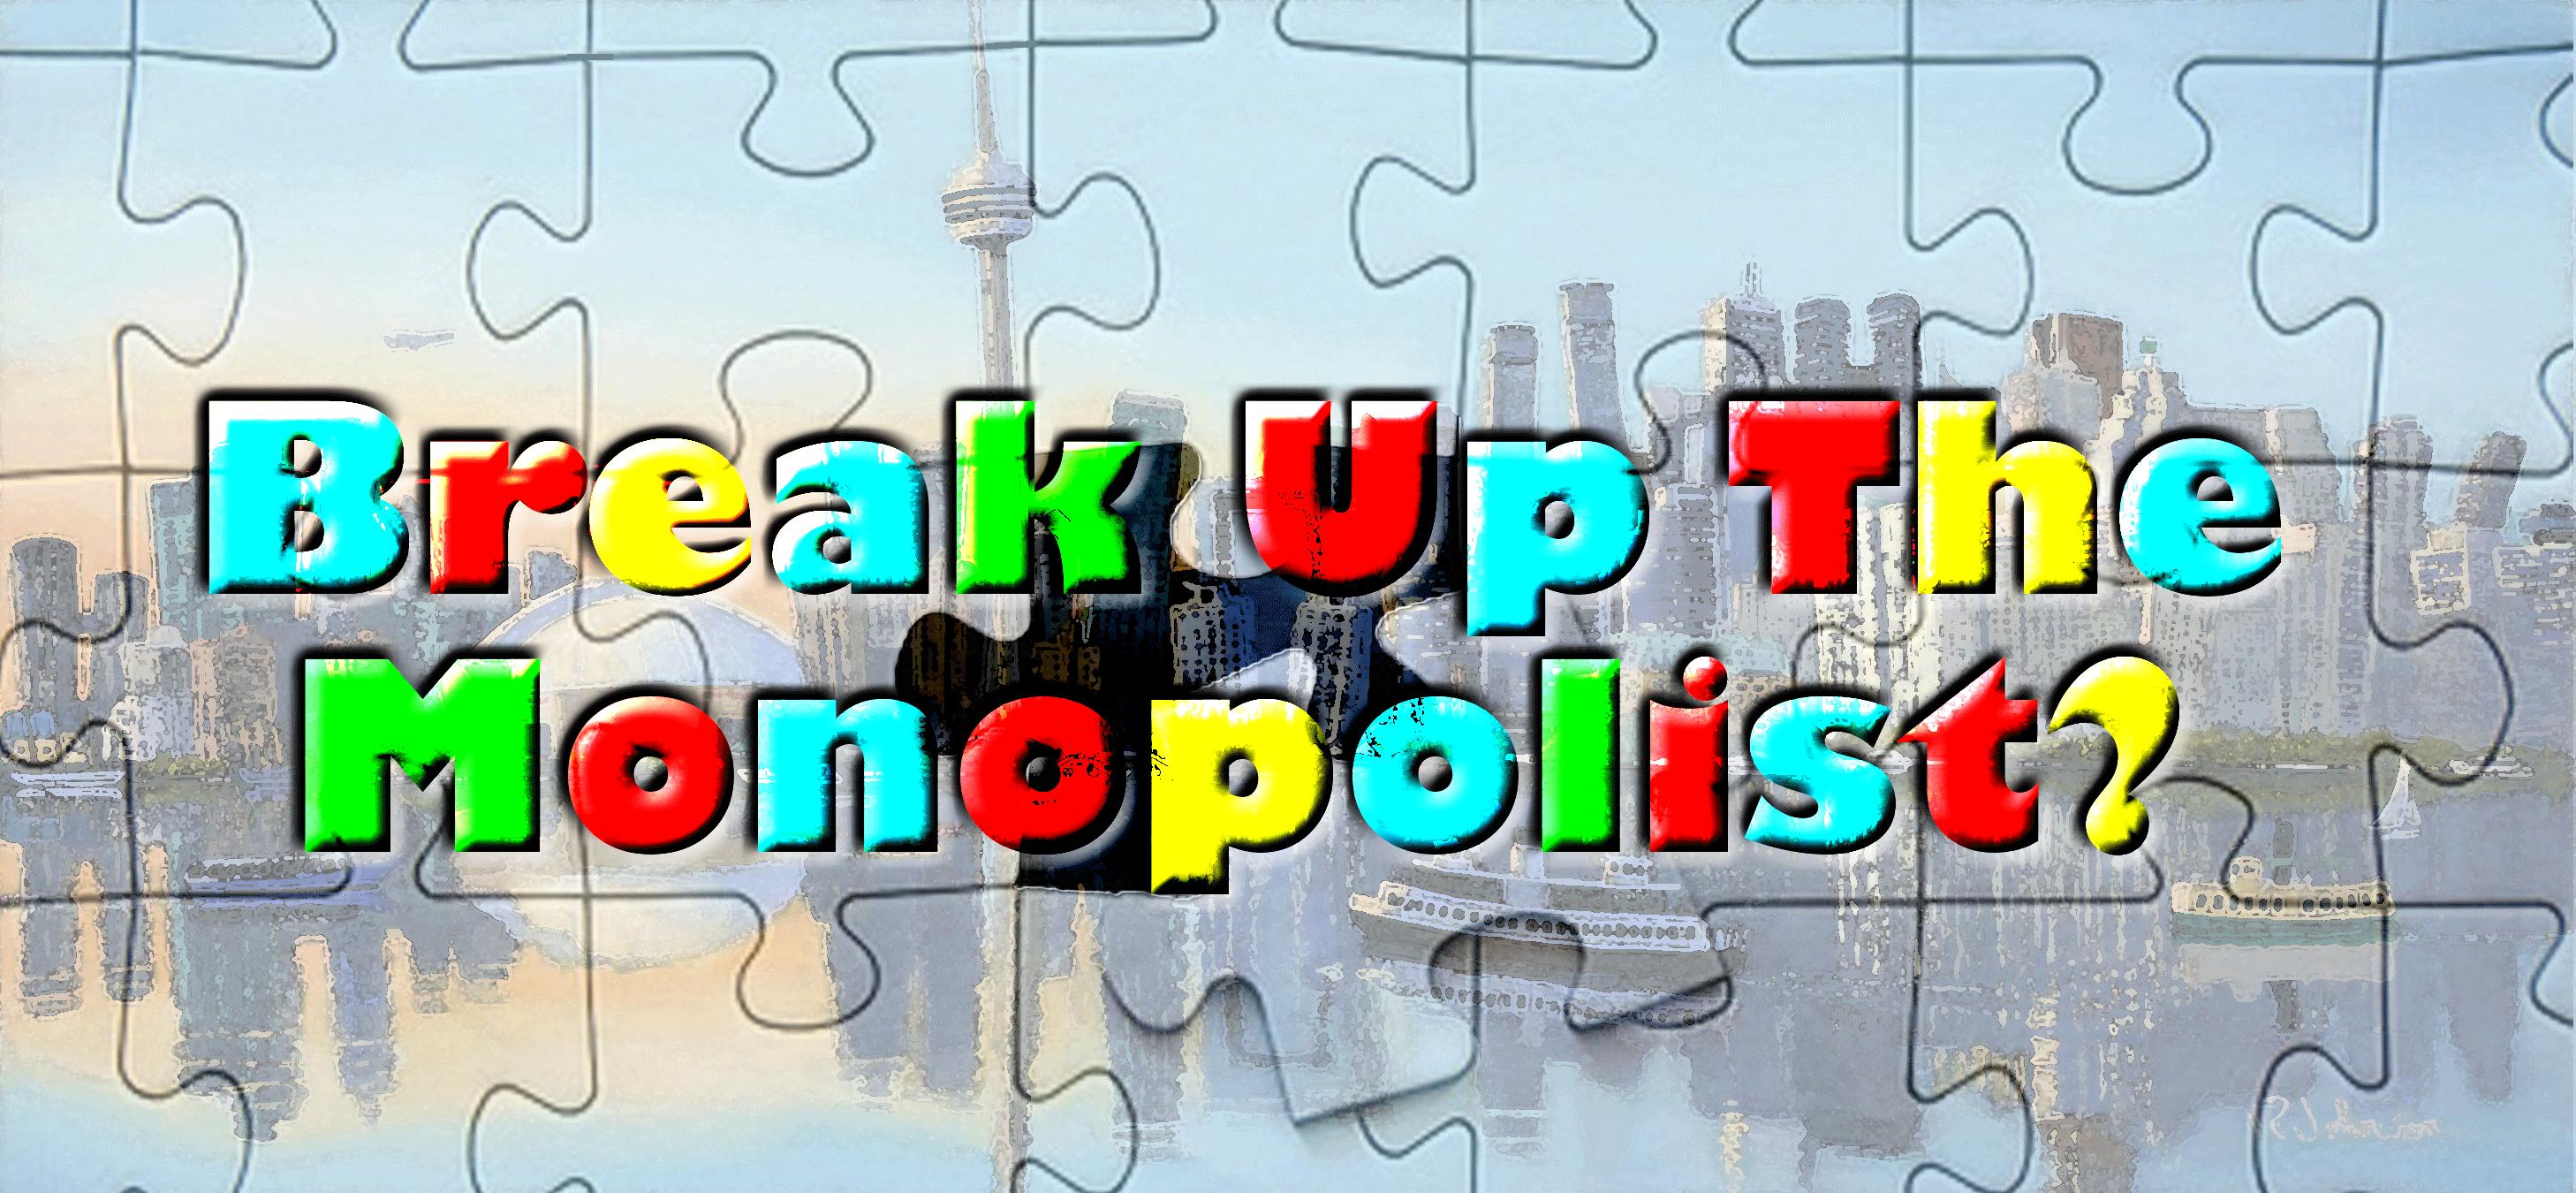 monopolist?